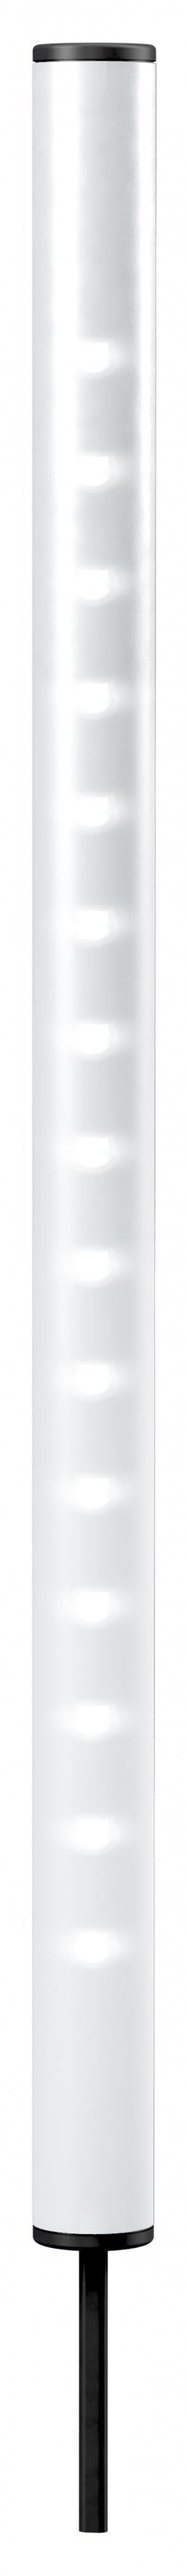 Osvetlenie Tetra Starter Line 105l 16W